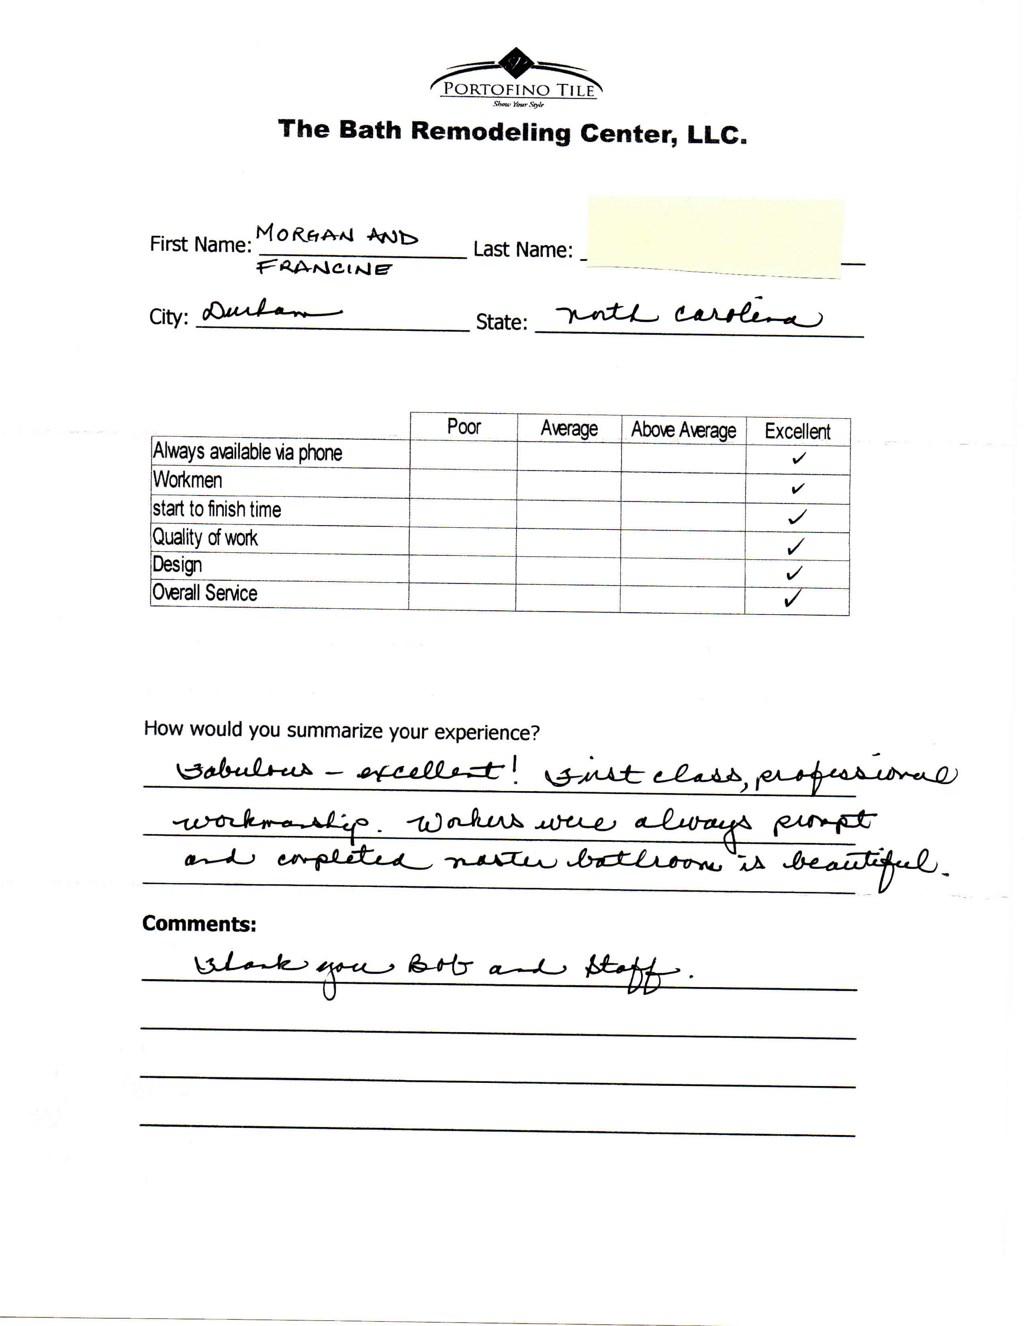 Portofino Tile The Bath Remodeling Center Reviews